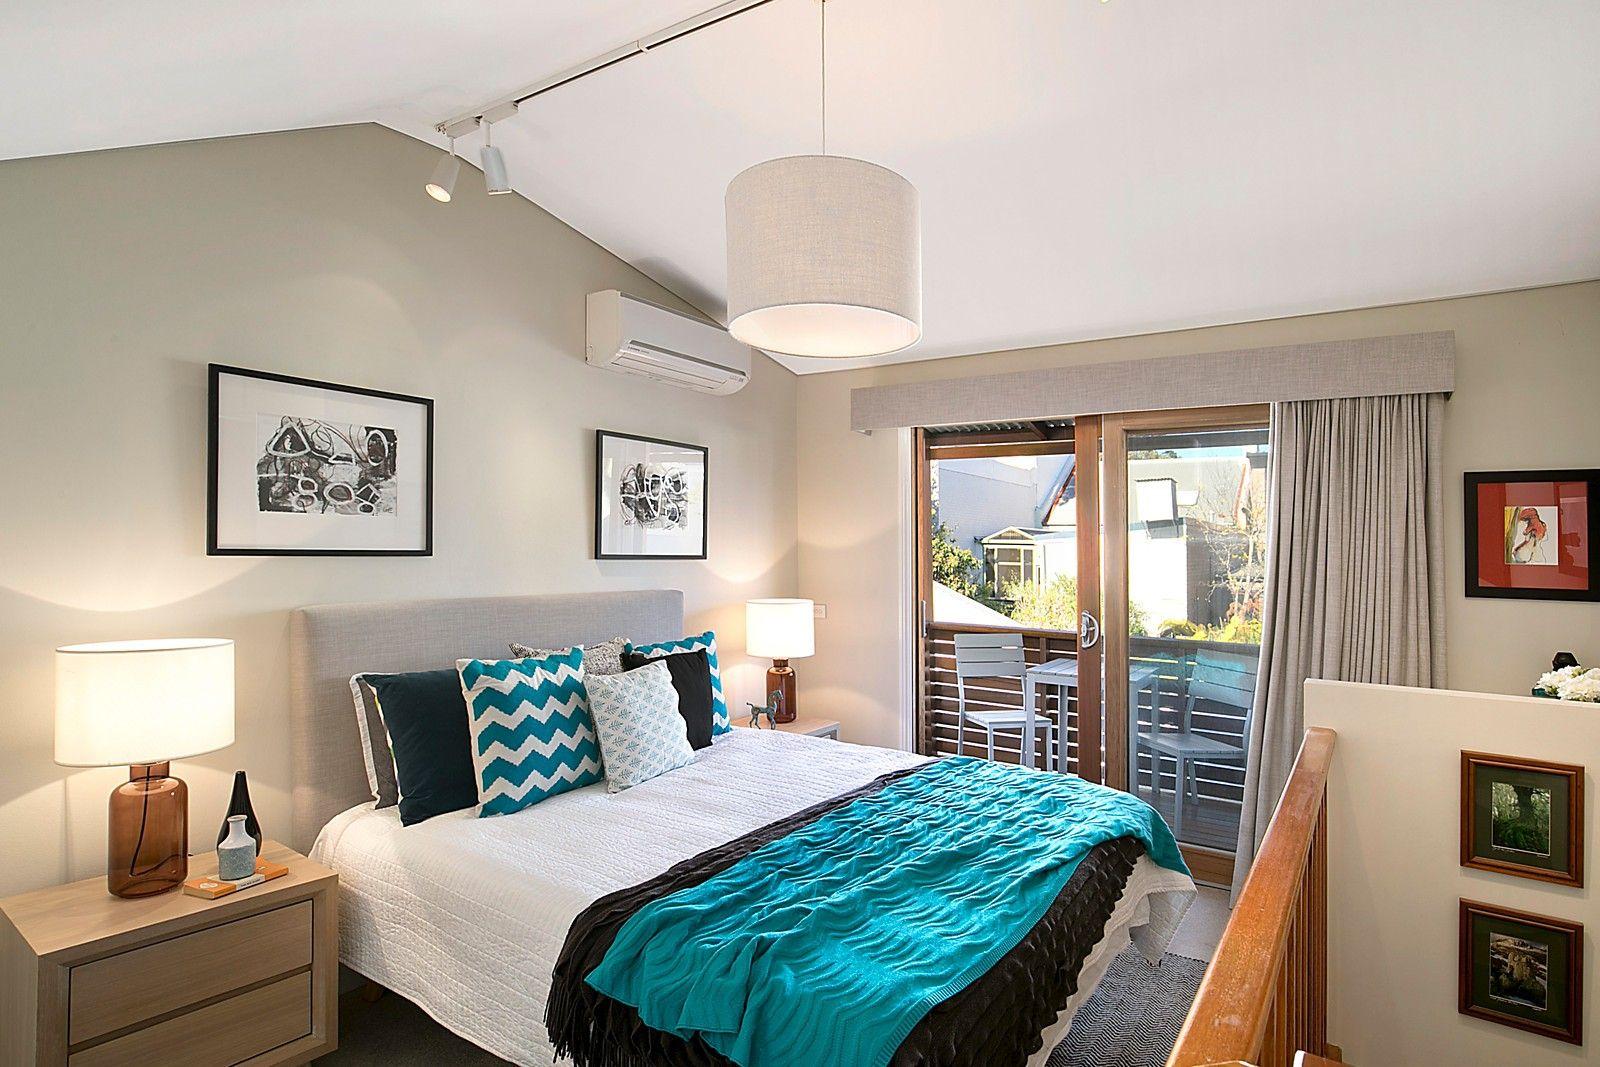 5 bedroom house interior main kingsize bedroom with built ins u balcony   ferris street